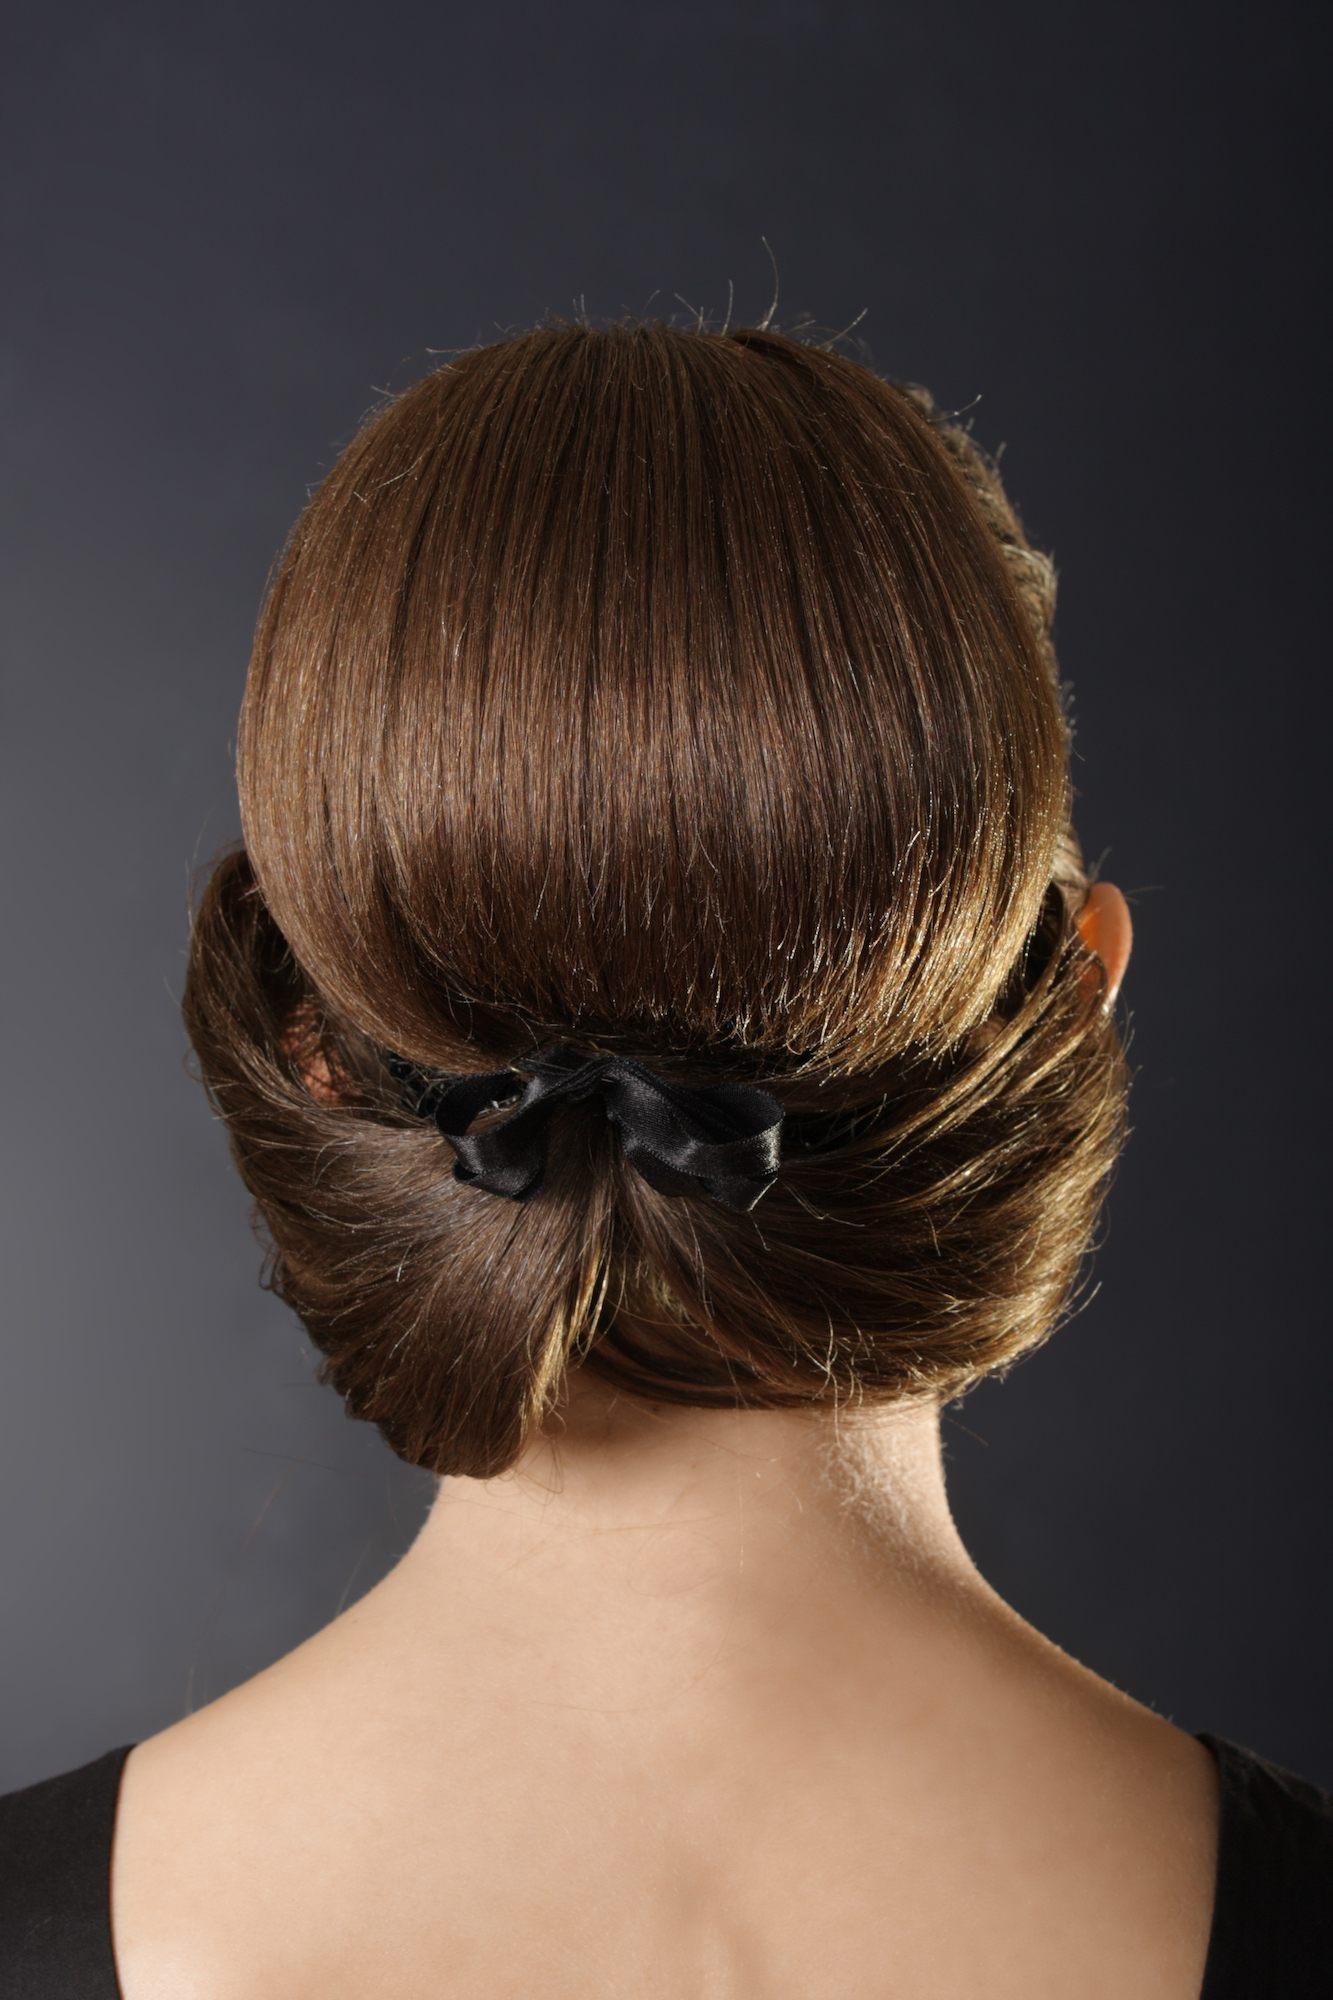 Gaya rambut pesta chignon modern rambut pendek.